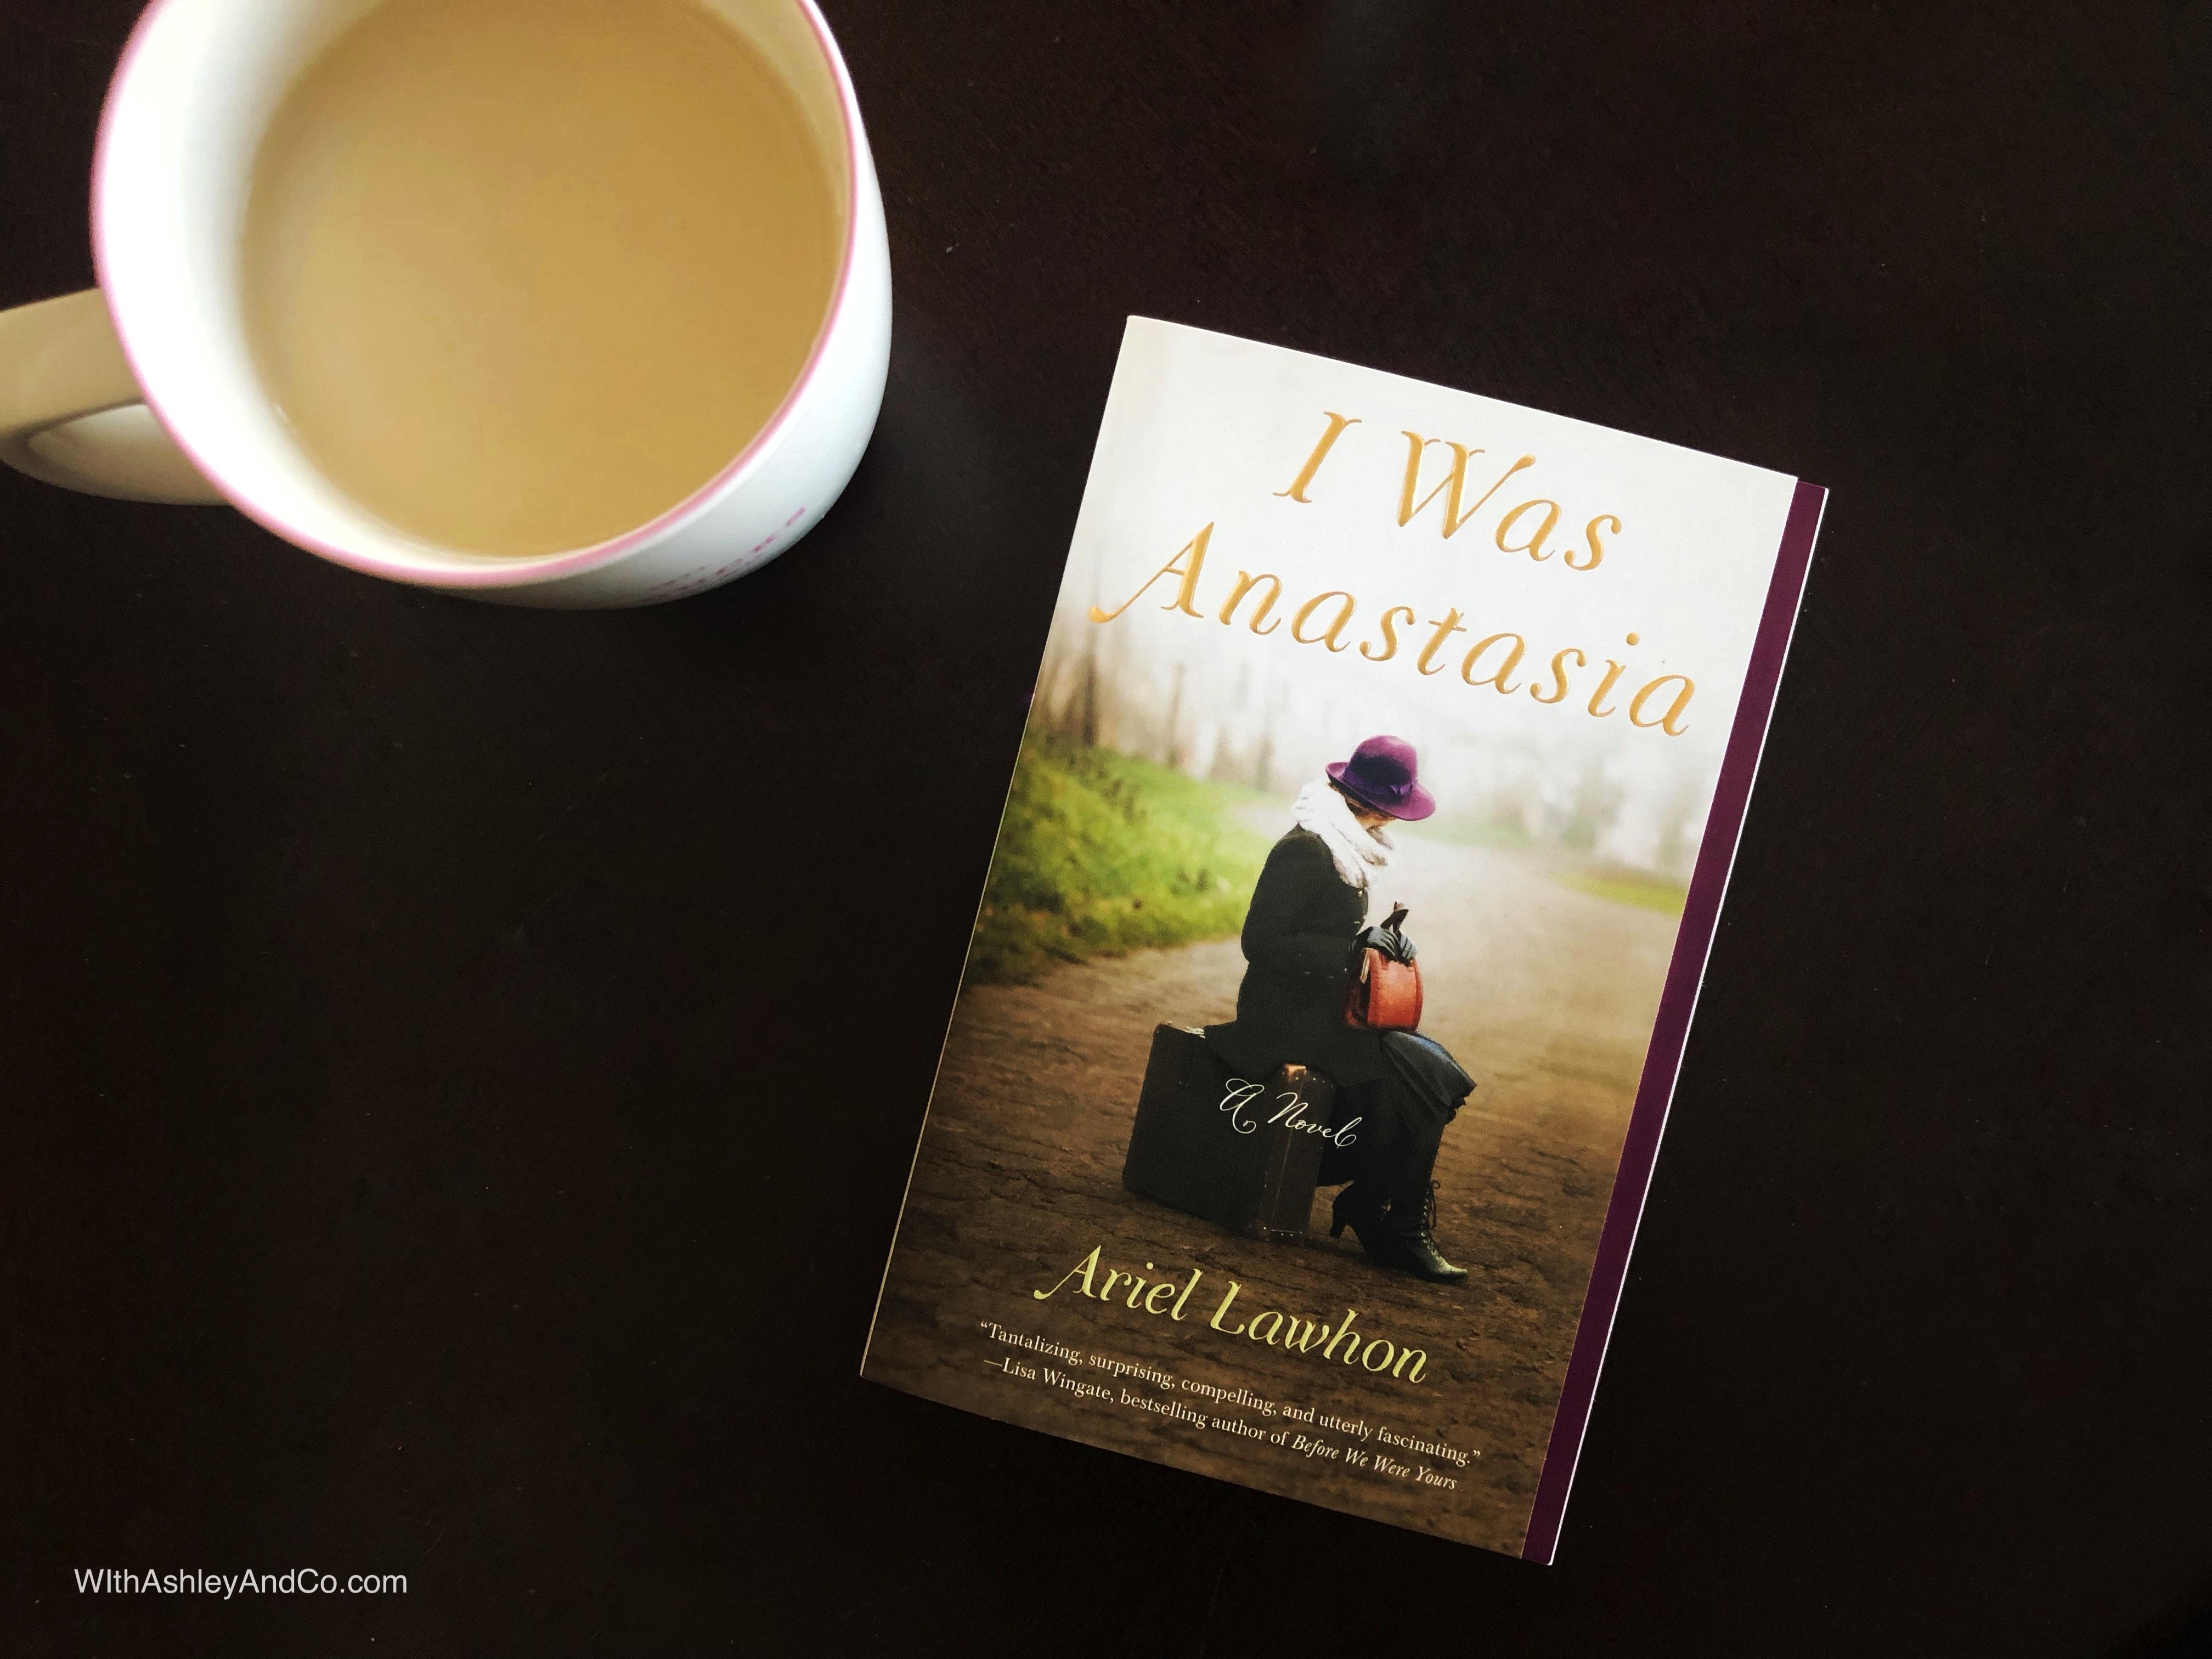 I Was Anastasia Review